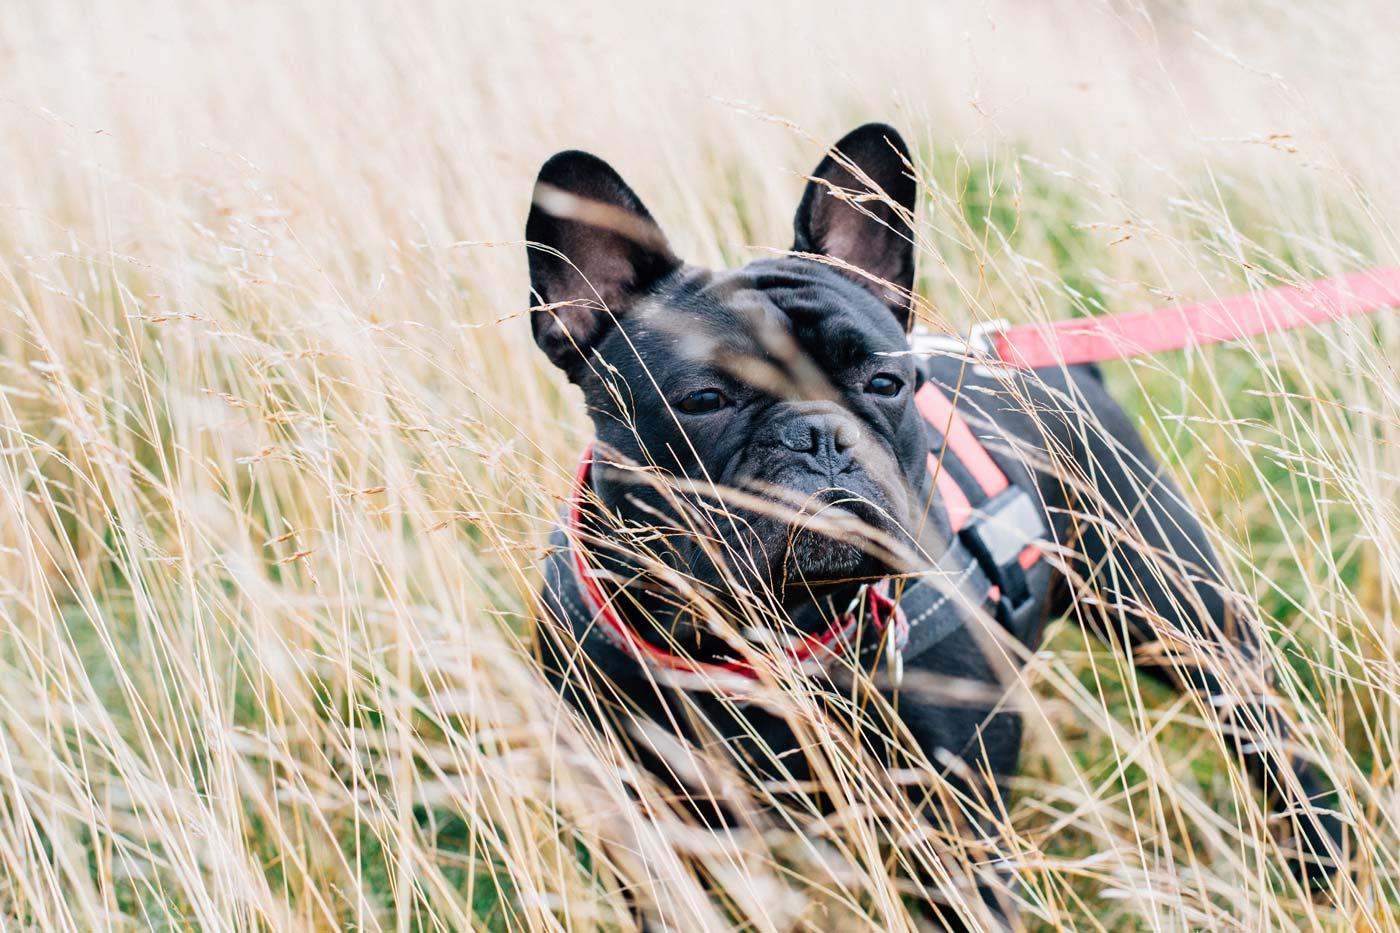 Fotografie Französische Bulldogge | Julia Friedl